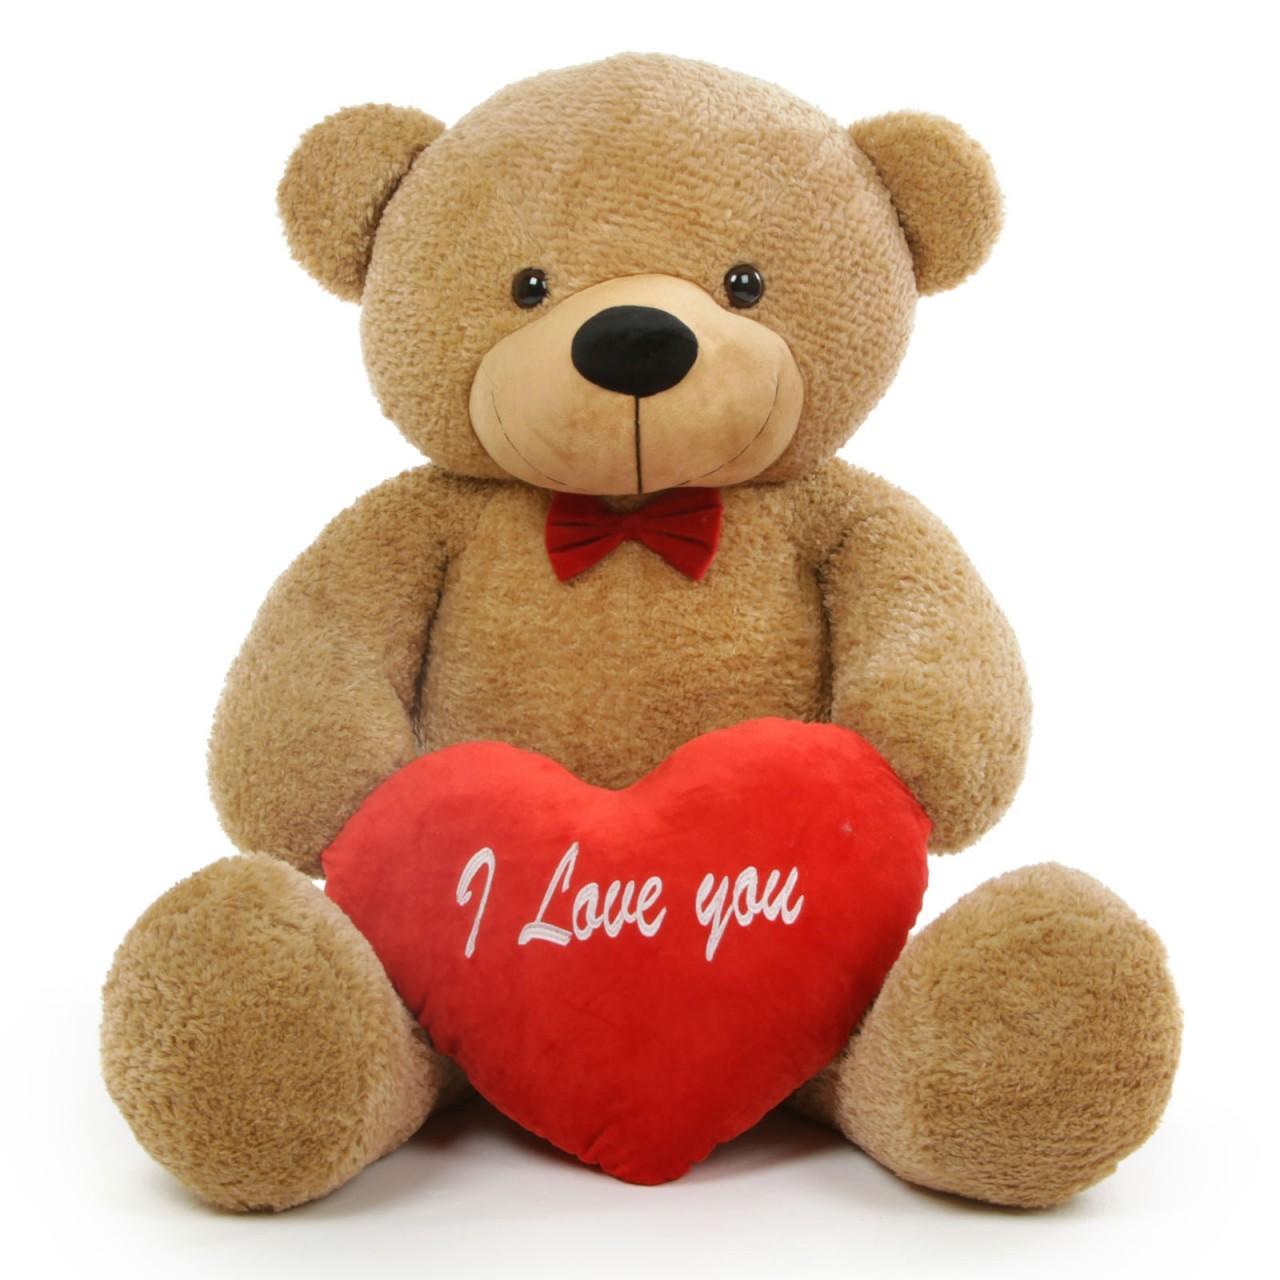 Gentleness With Cute Teddy Bears